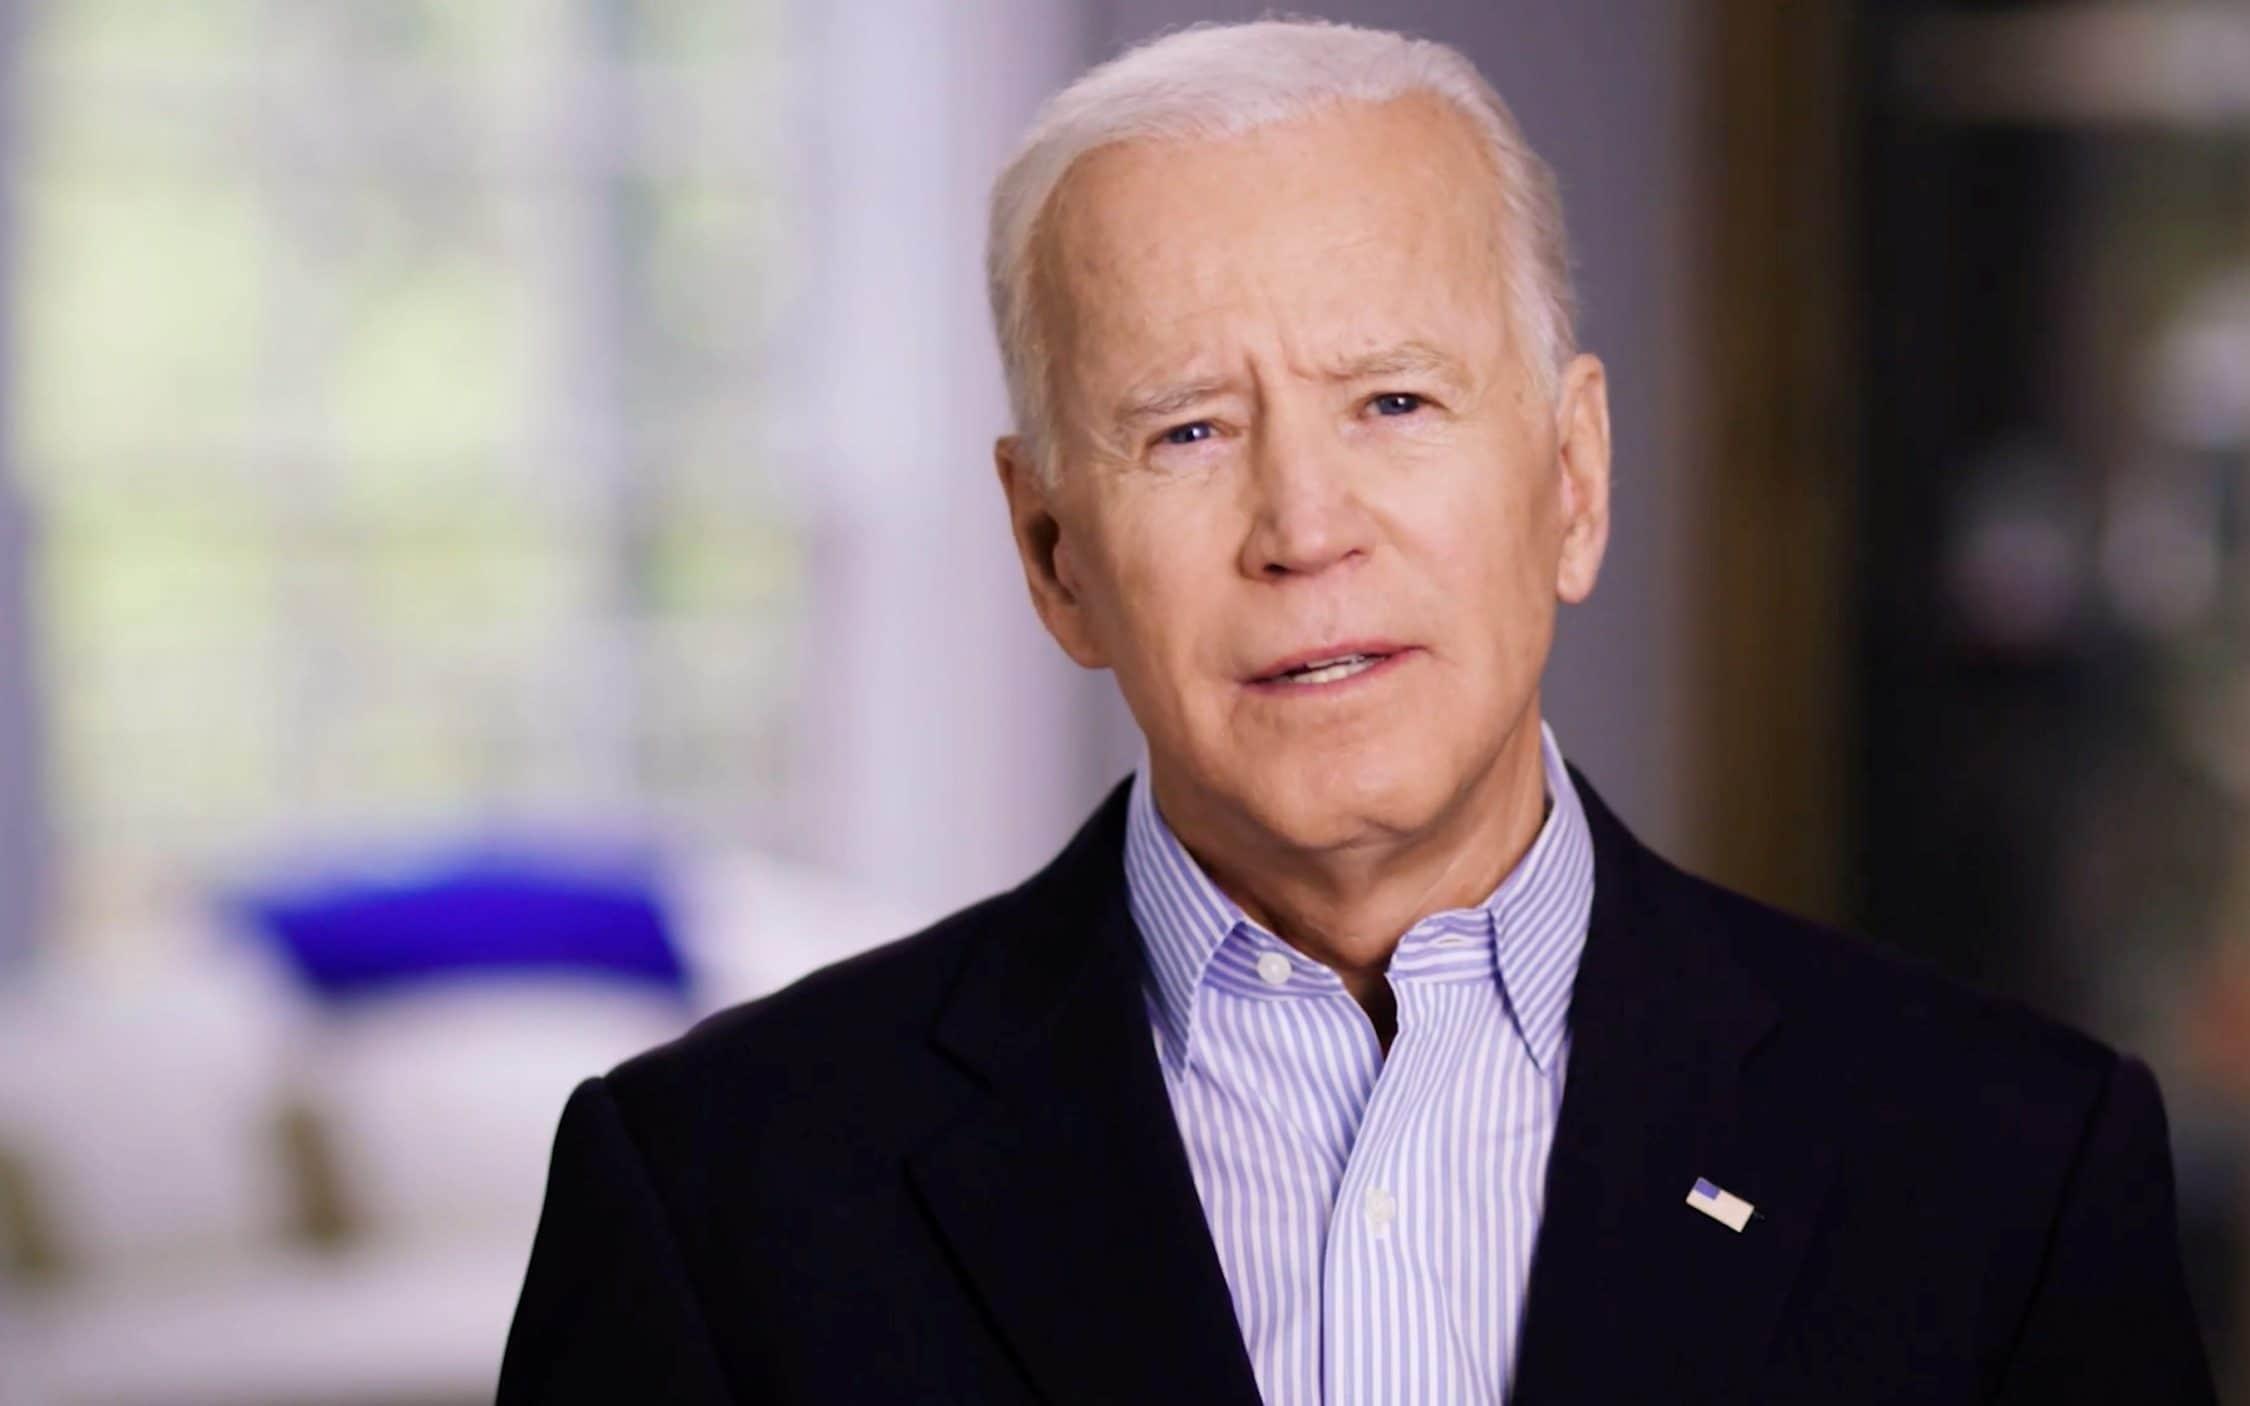 Joe Biden indicates he would testify in Donald Trump impeachment trial if subpoenaed